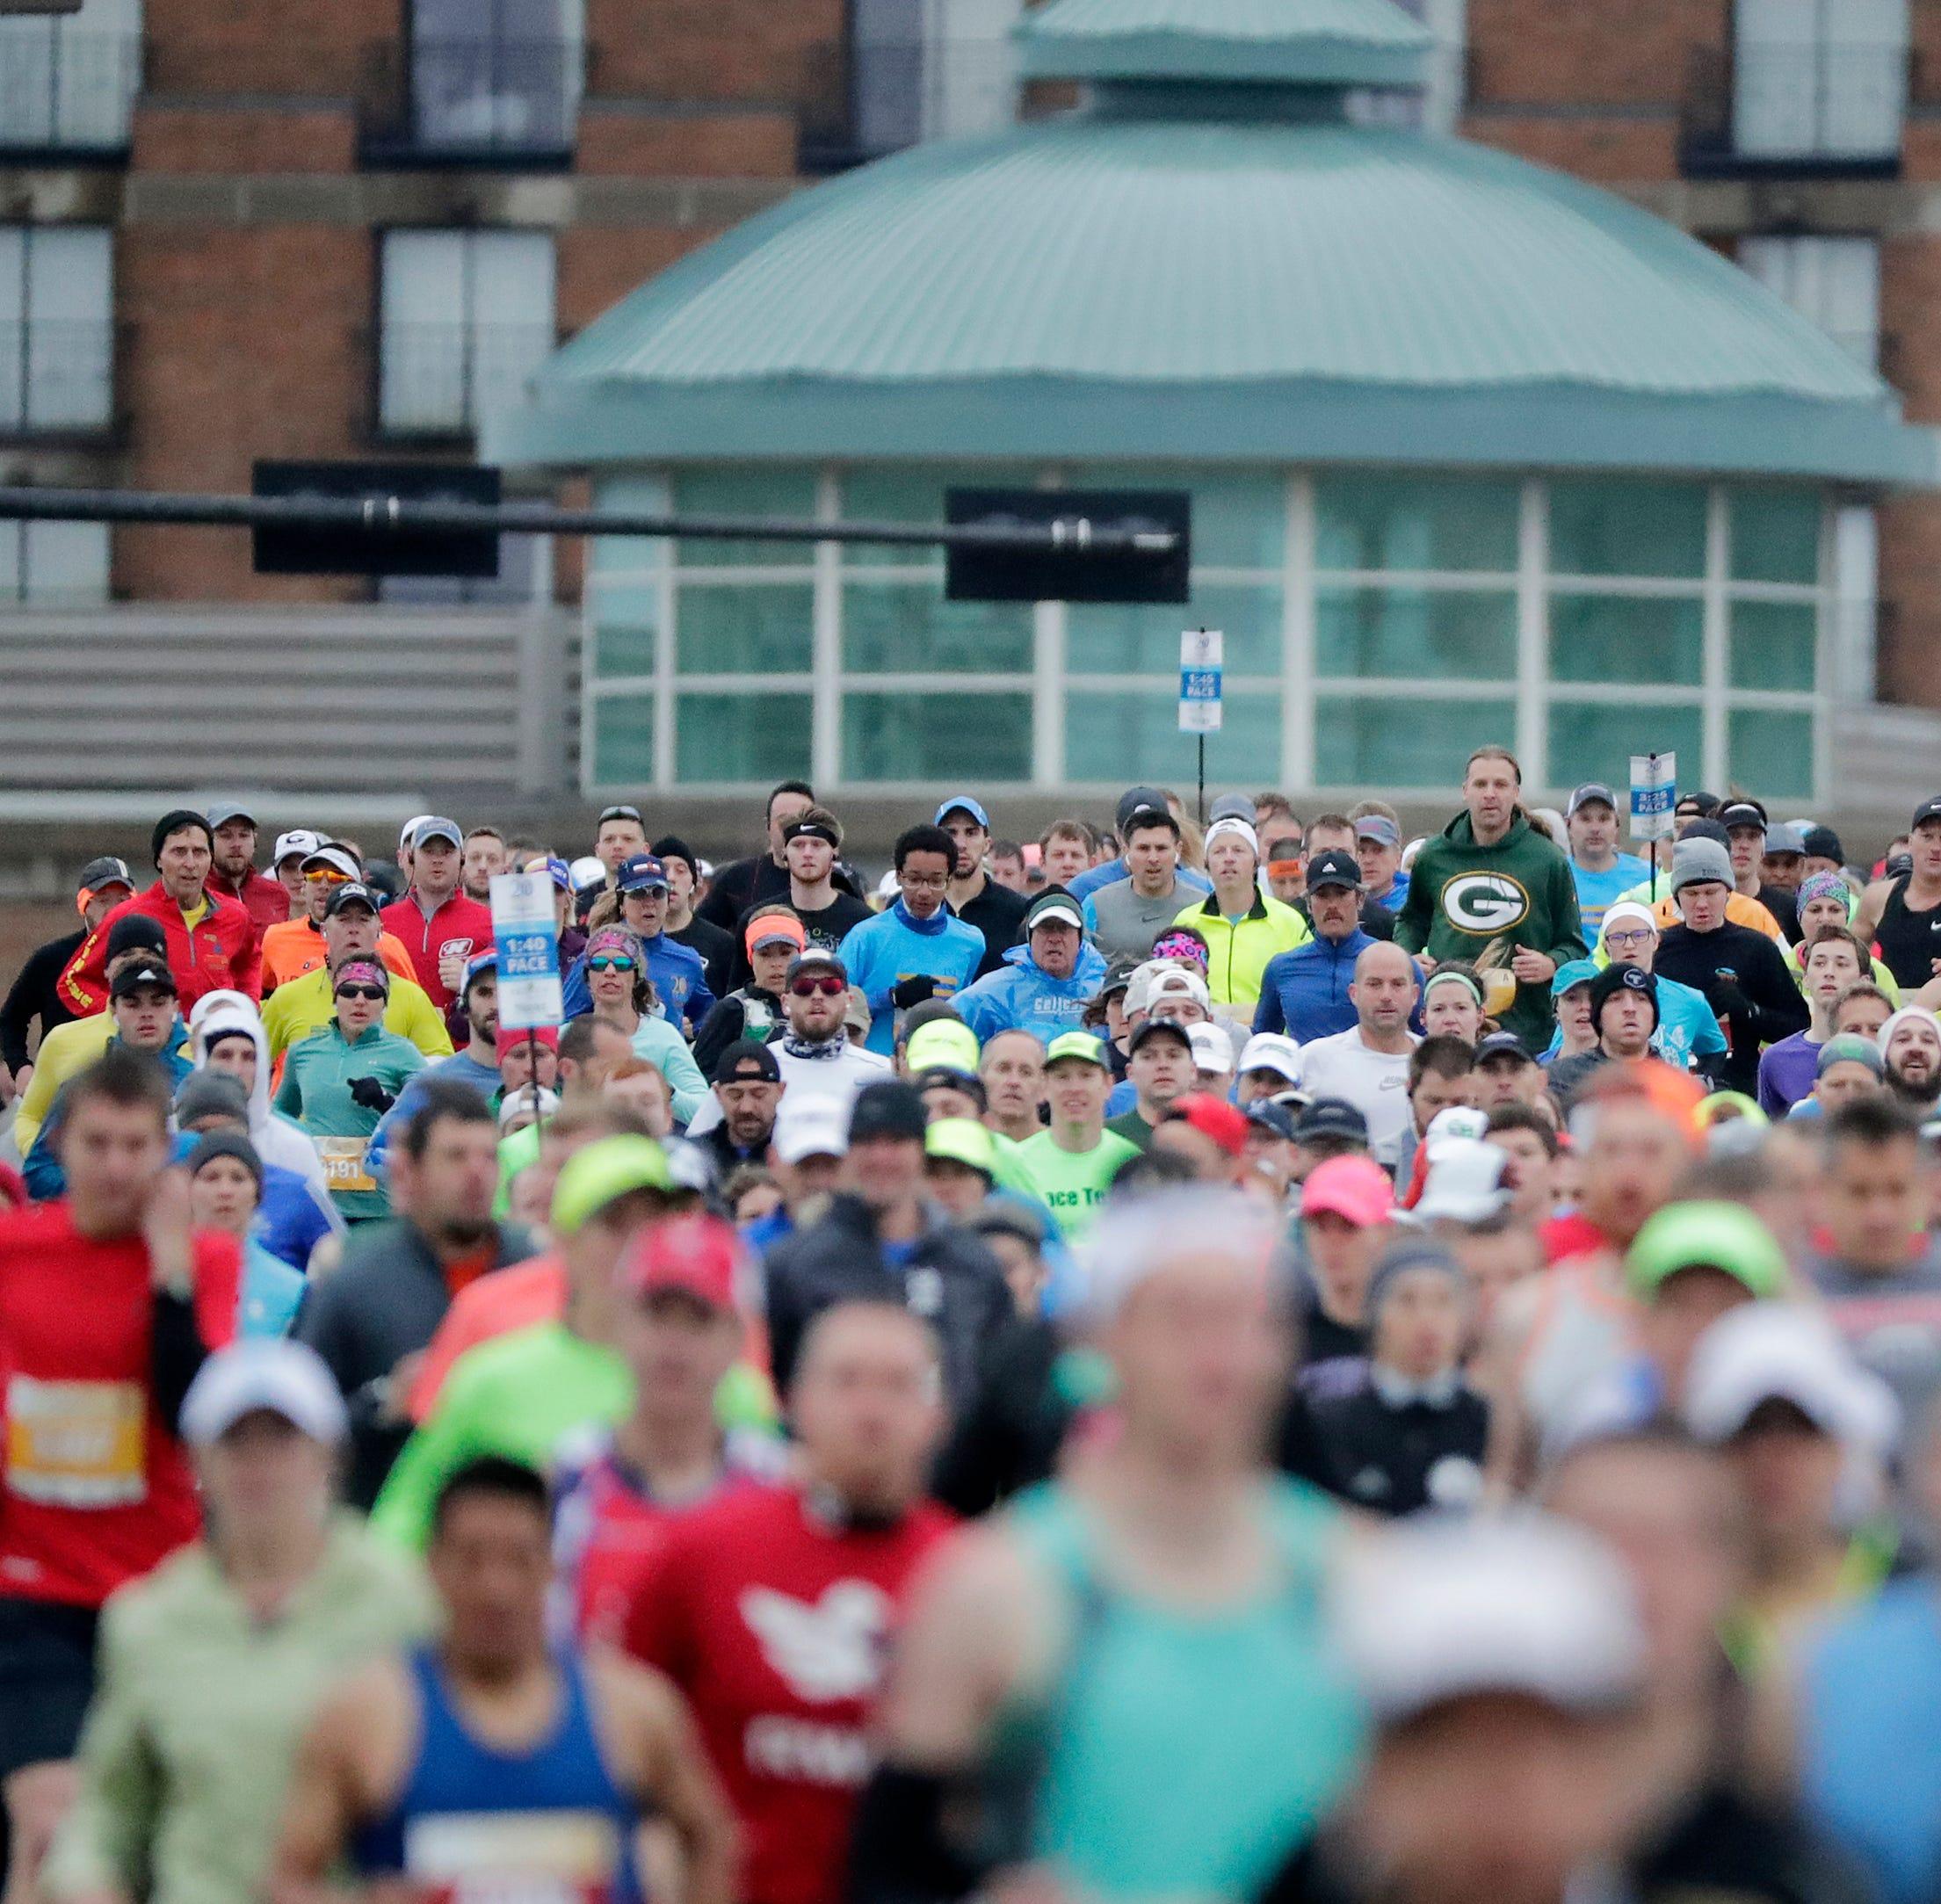 Cellcom Green Bay Marathon results: Top 50 finishers